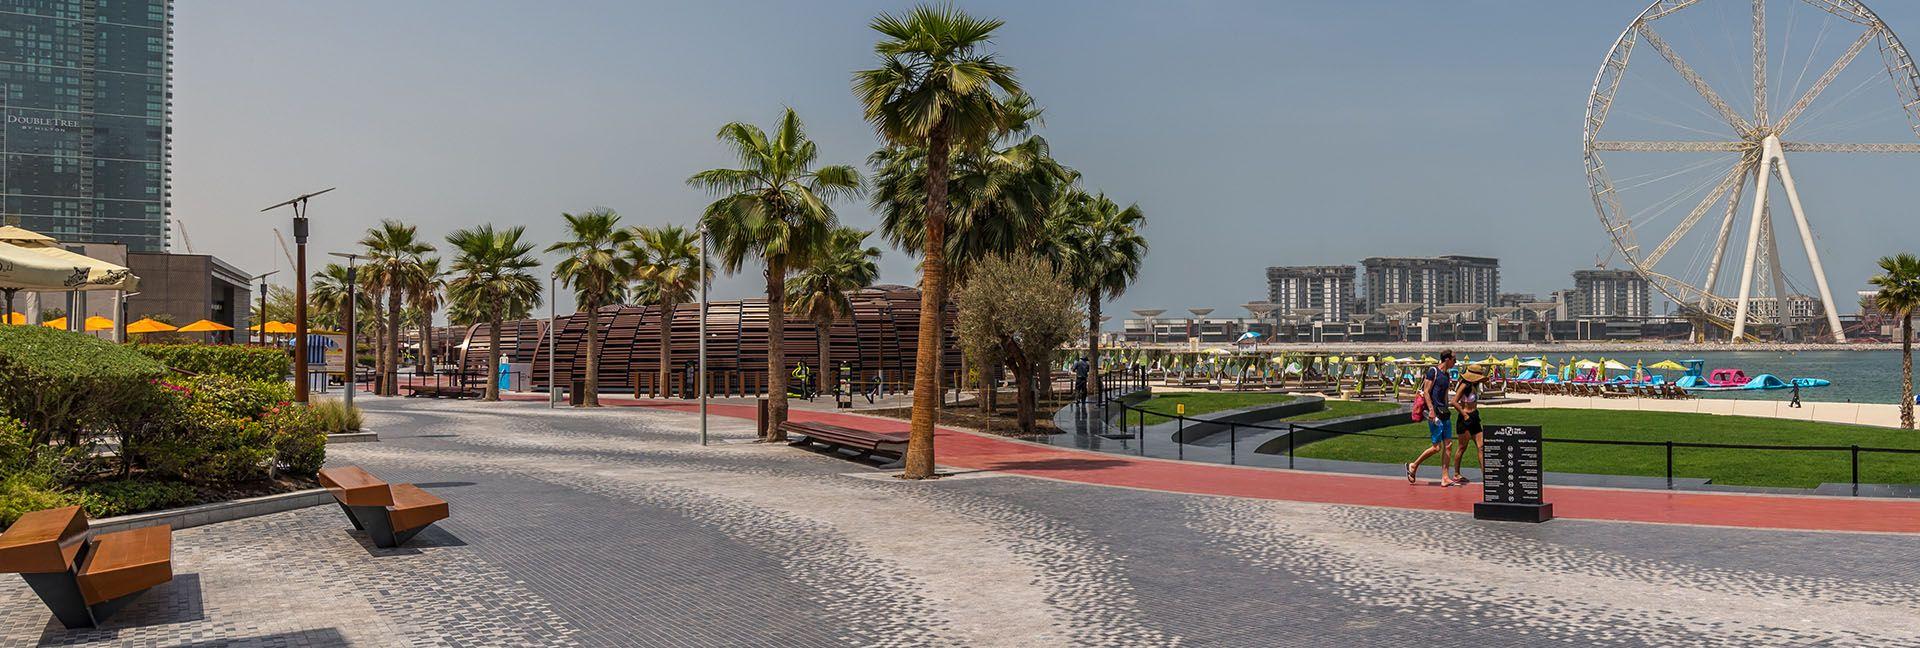 jumeirah-beach-residence-banner.jpg